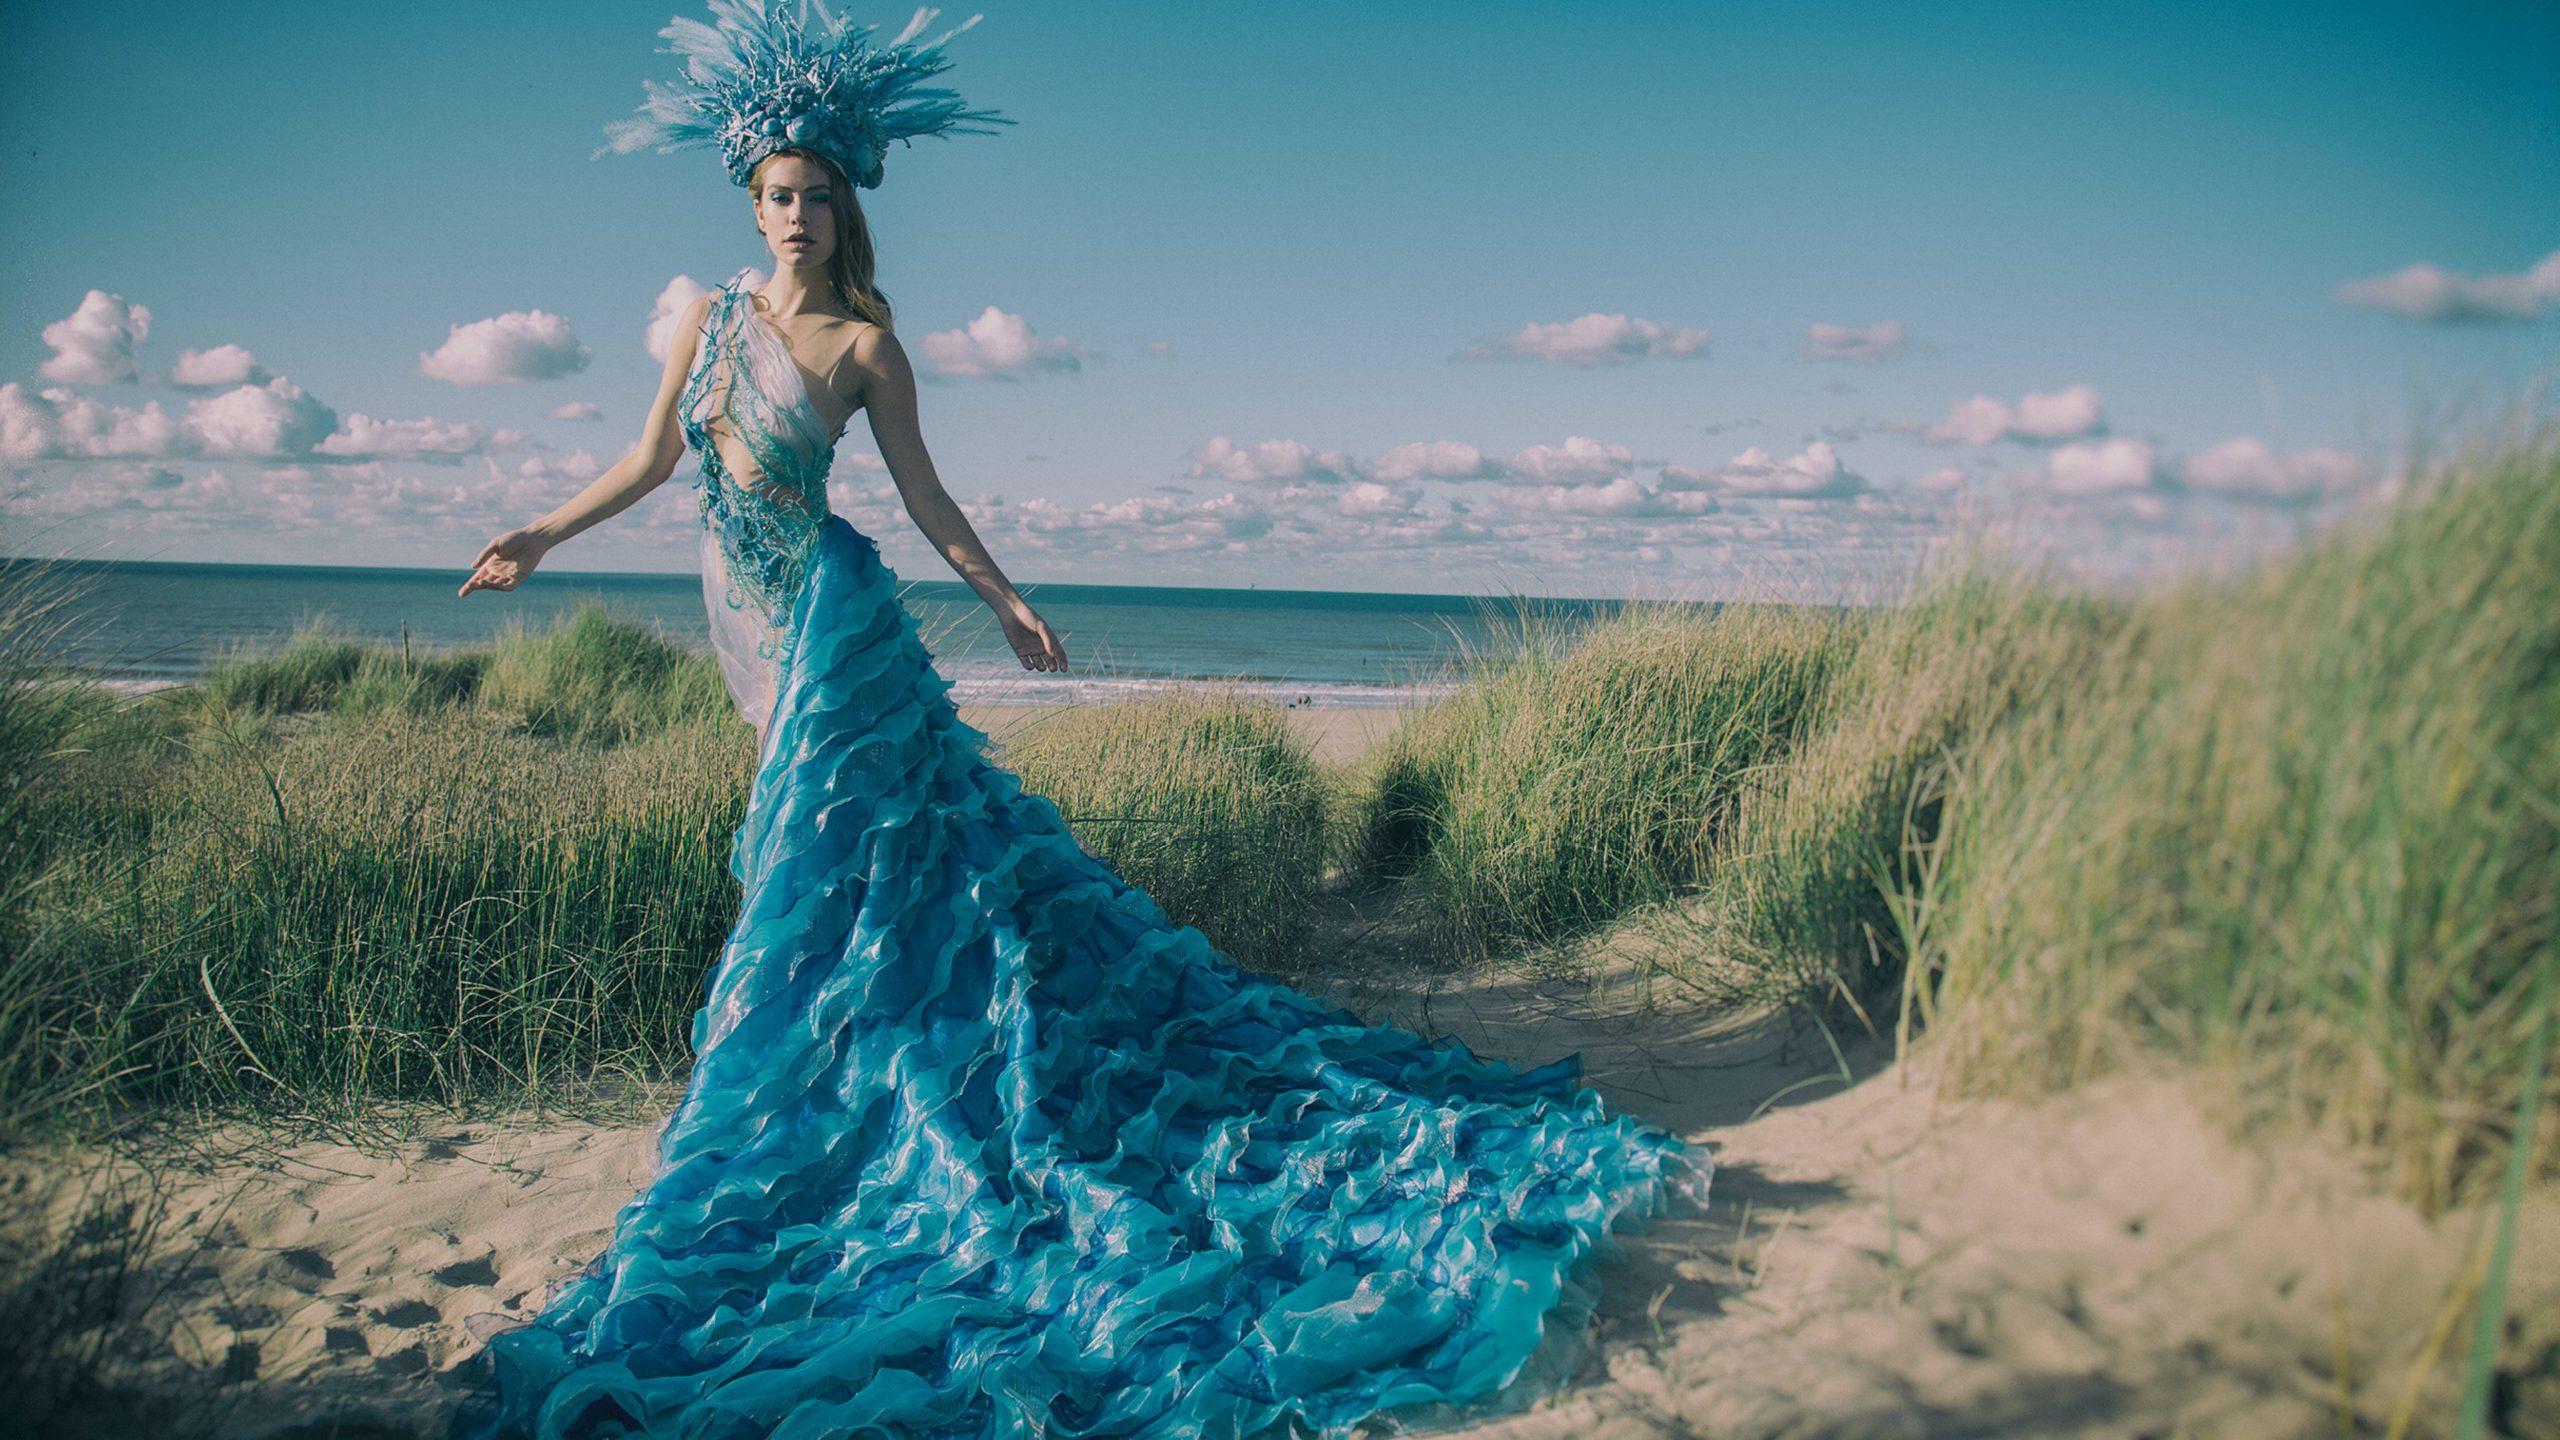 Miss NL - Sharon Pieksma - National Costume - Foto William Setiawan